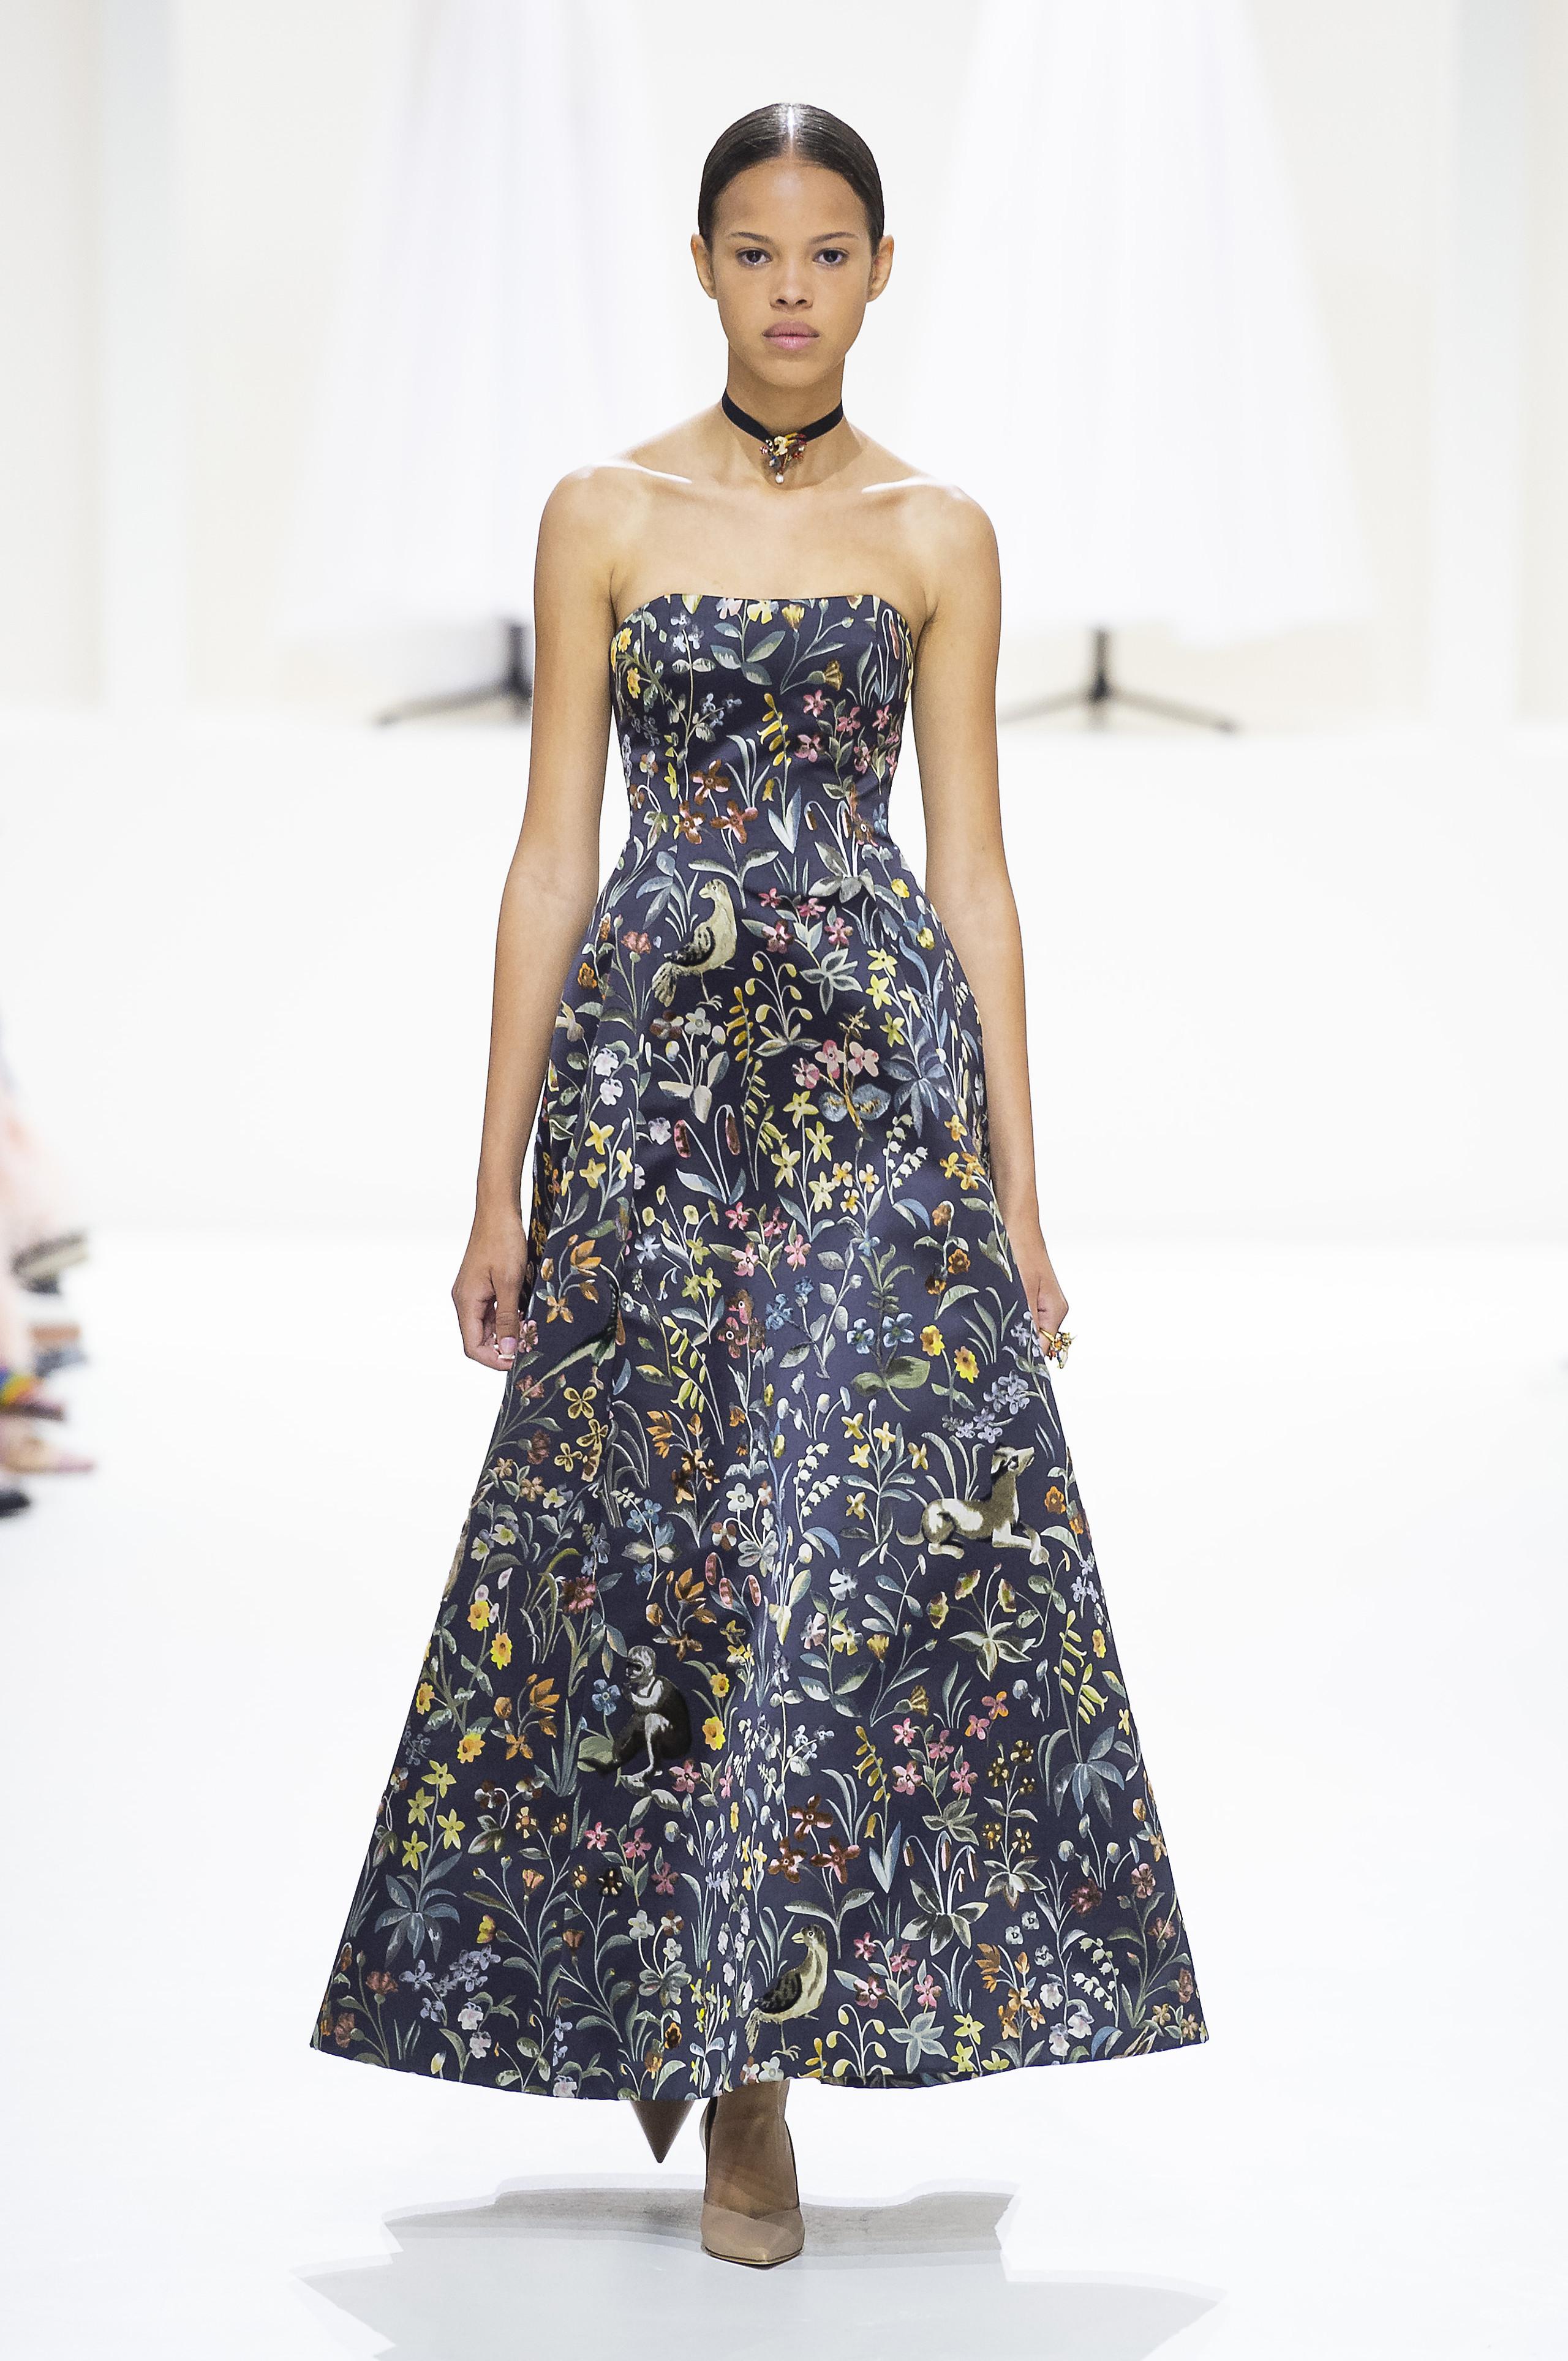 Dior desfile de Alta Costura 2018/2019